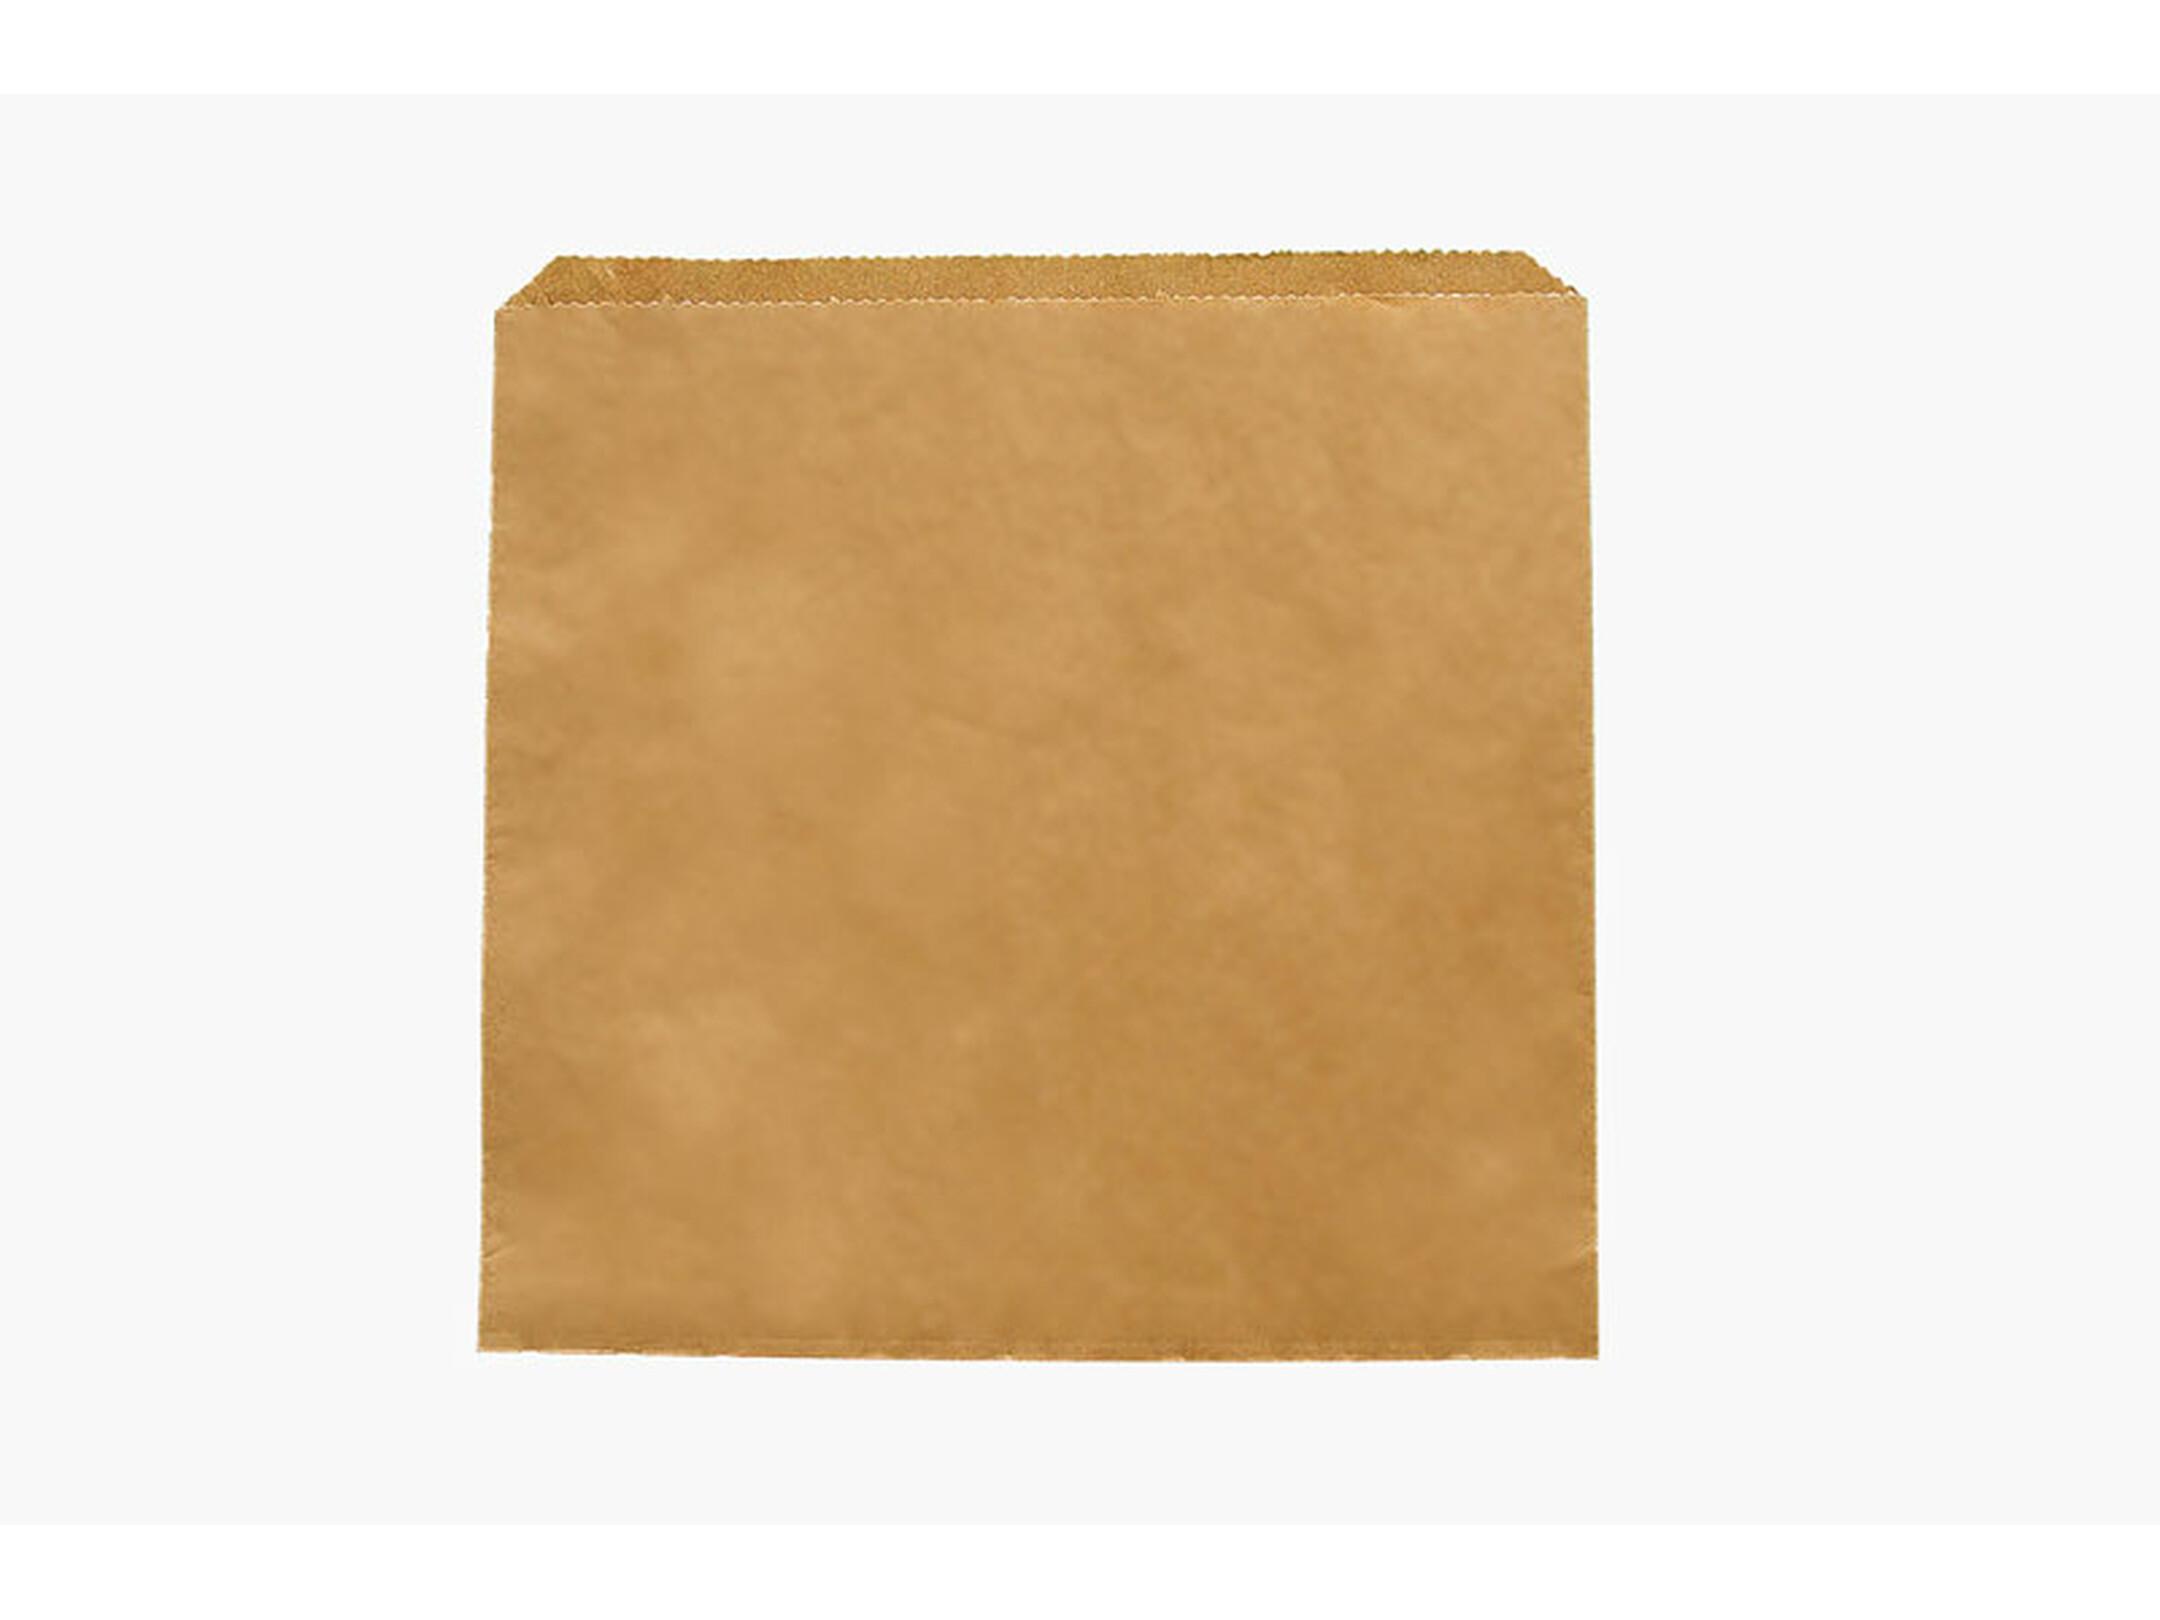 sac papier à fond plat brun 30 x 30 cm